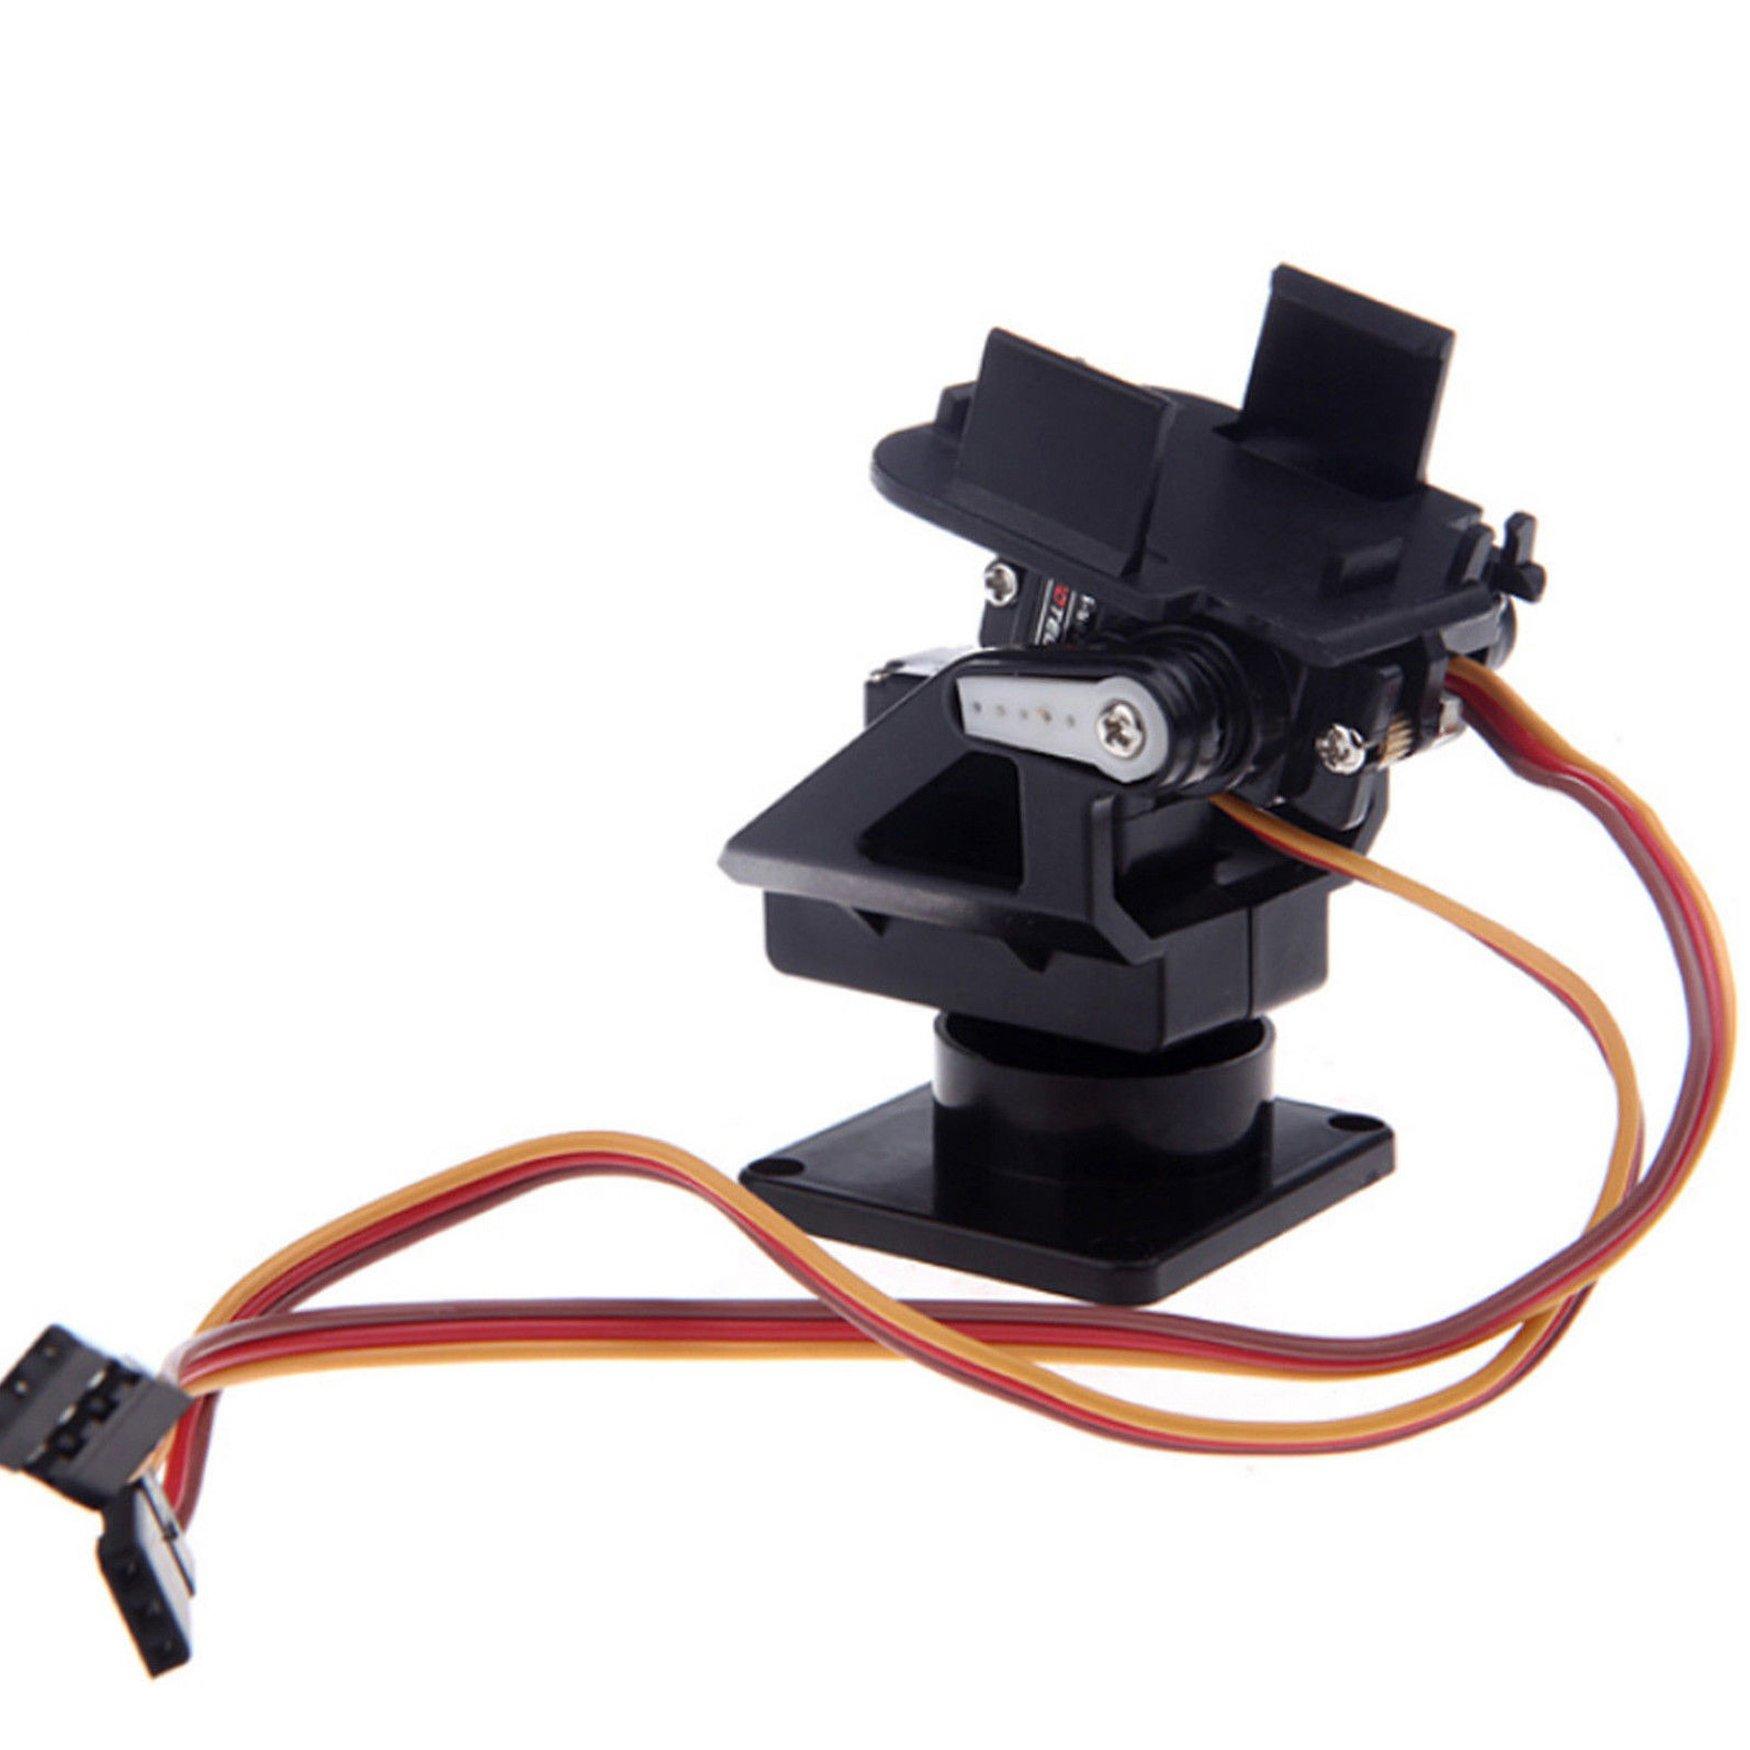 Pan Tilt Servo Gimbal for FPV Drone Board Cameras - Includes 2x 9g Servo